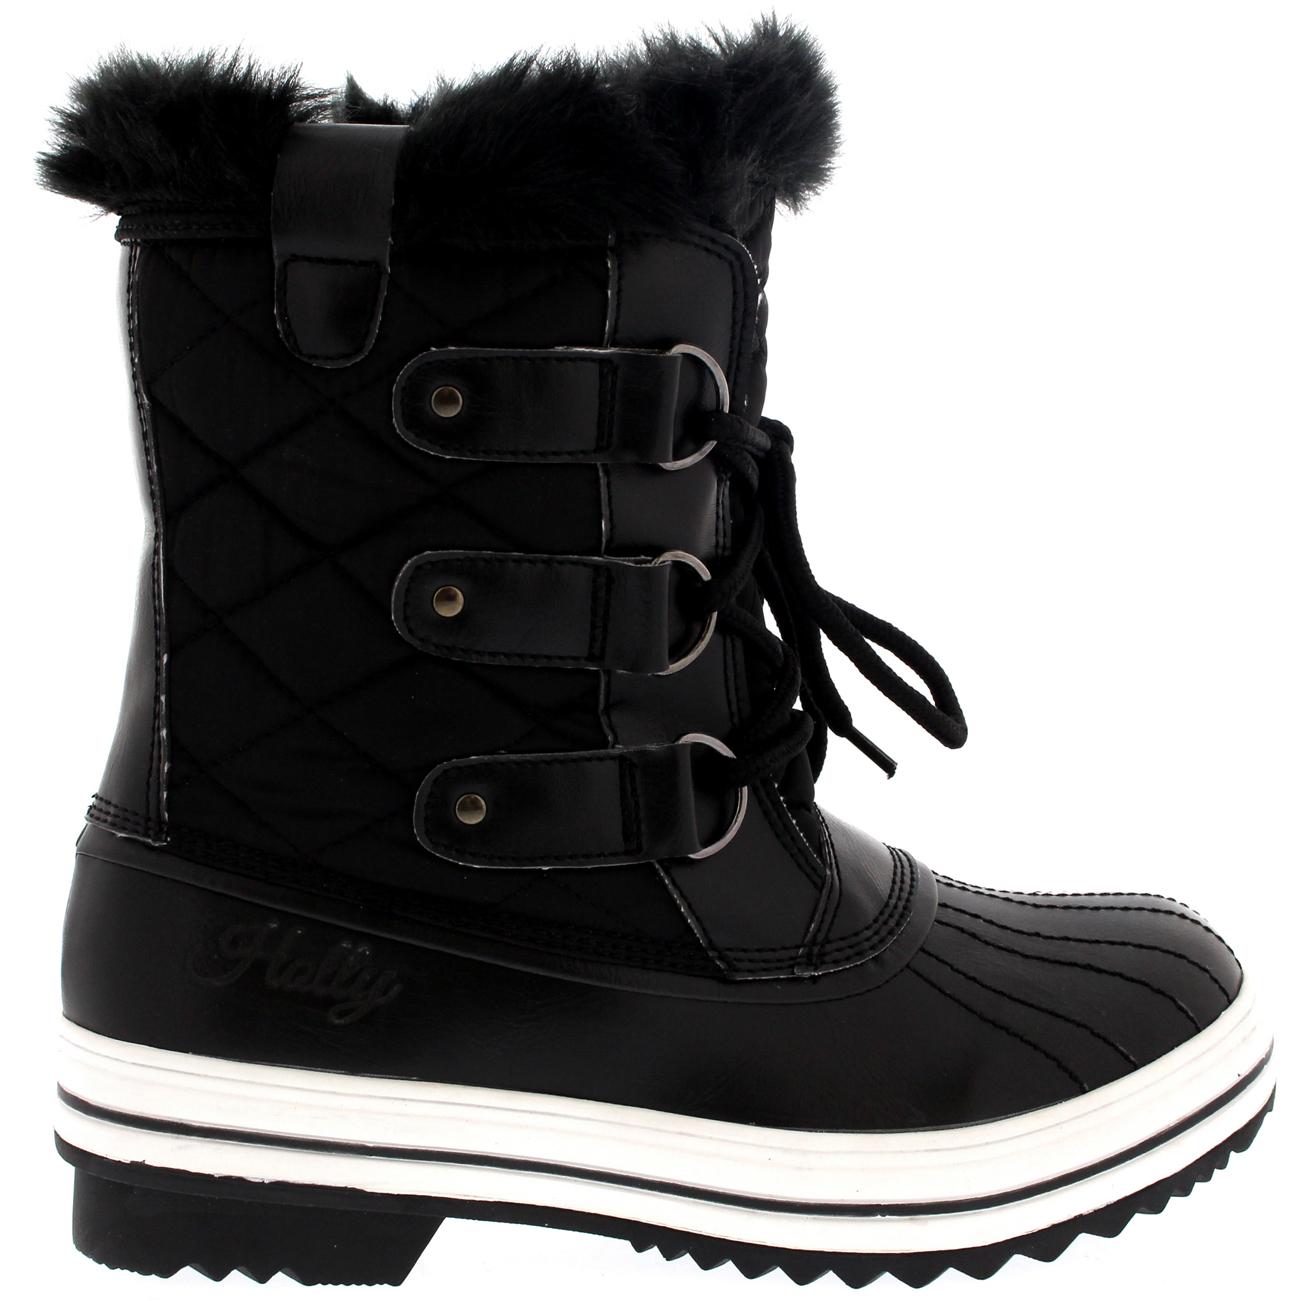 Amazing Details About Womens Snow Boot Nylon Short Winter Snow Fur Rain Warm